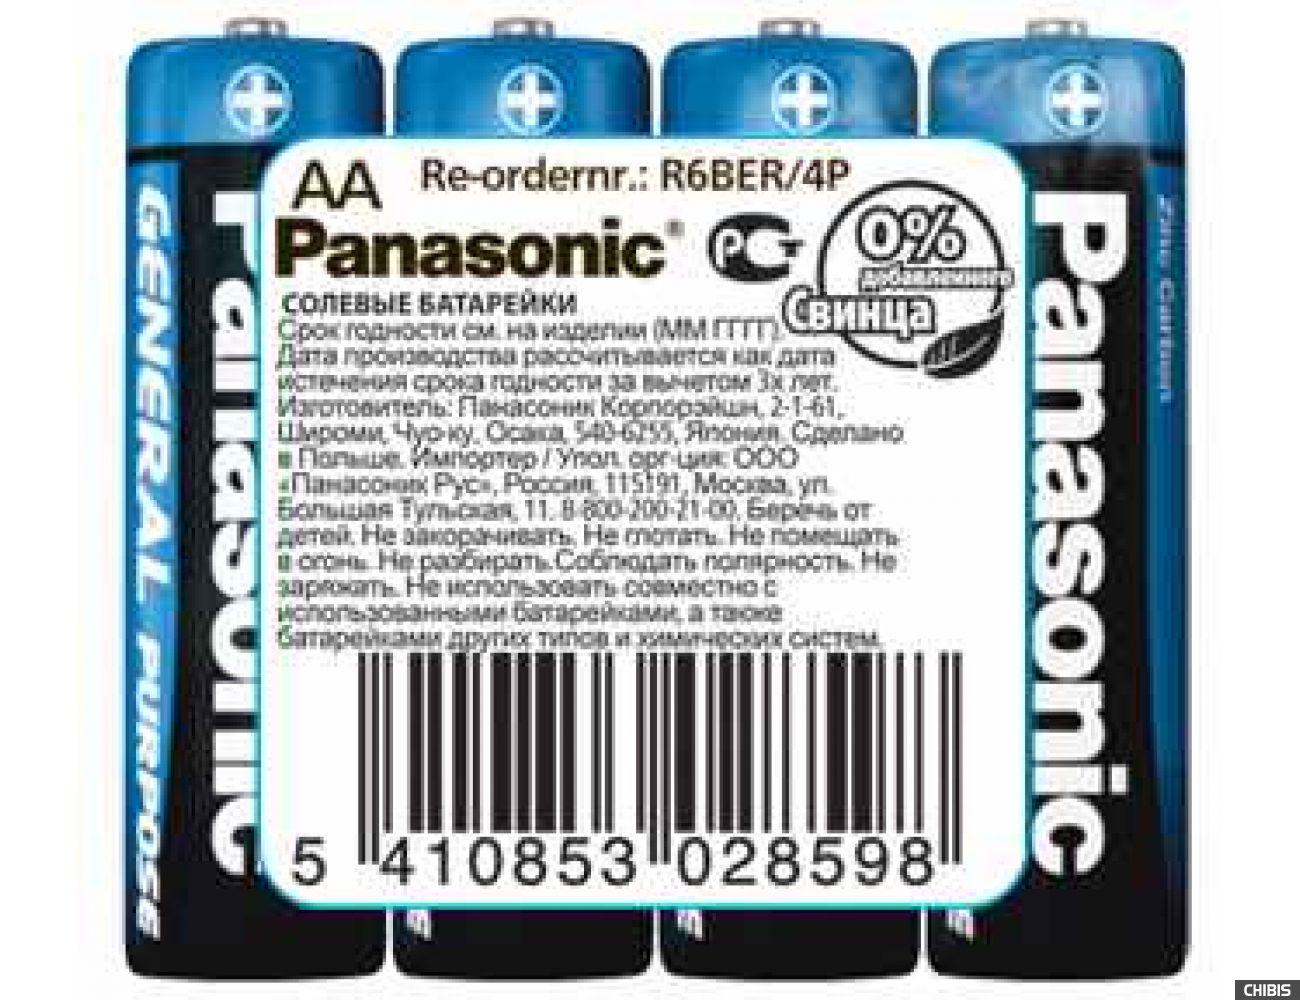 Батарейка АА Panasonic General Purpose R06 1.5V Цинково-угольная 4/4 пленка